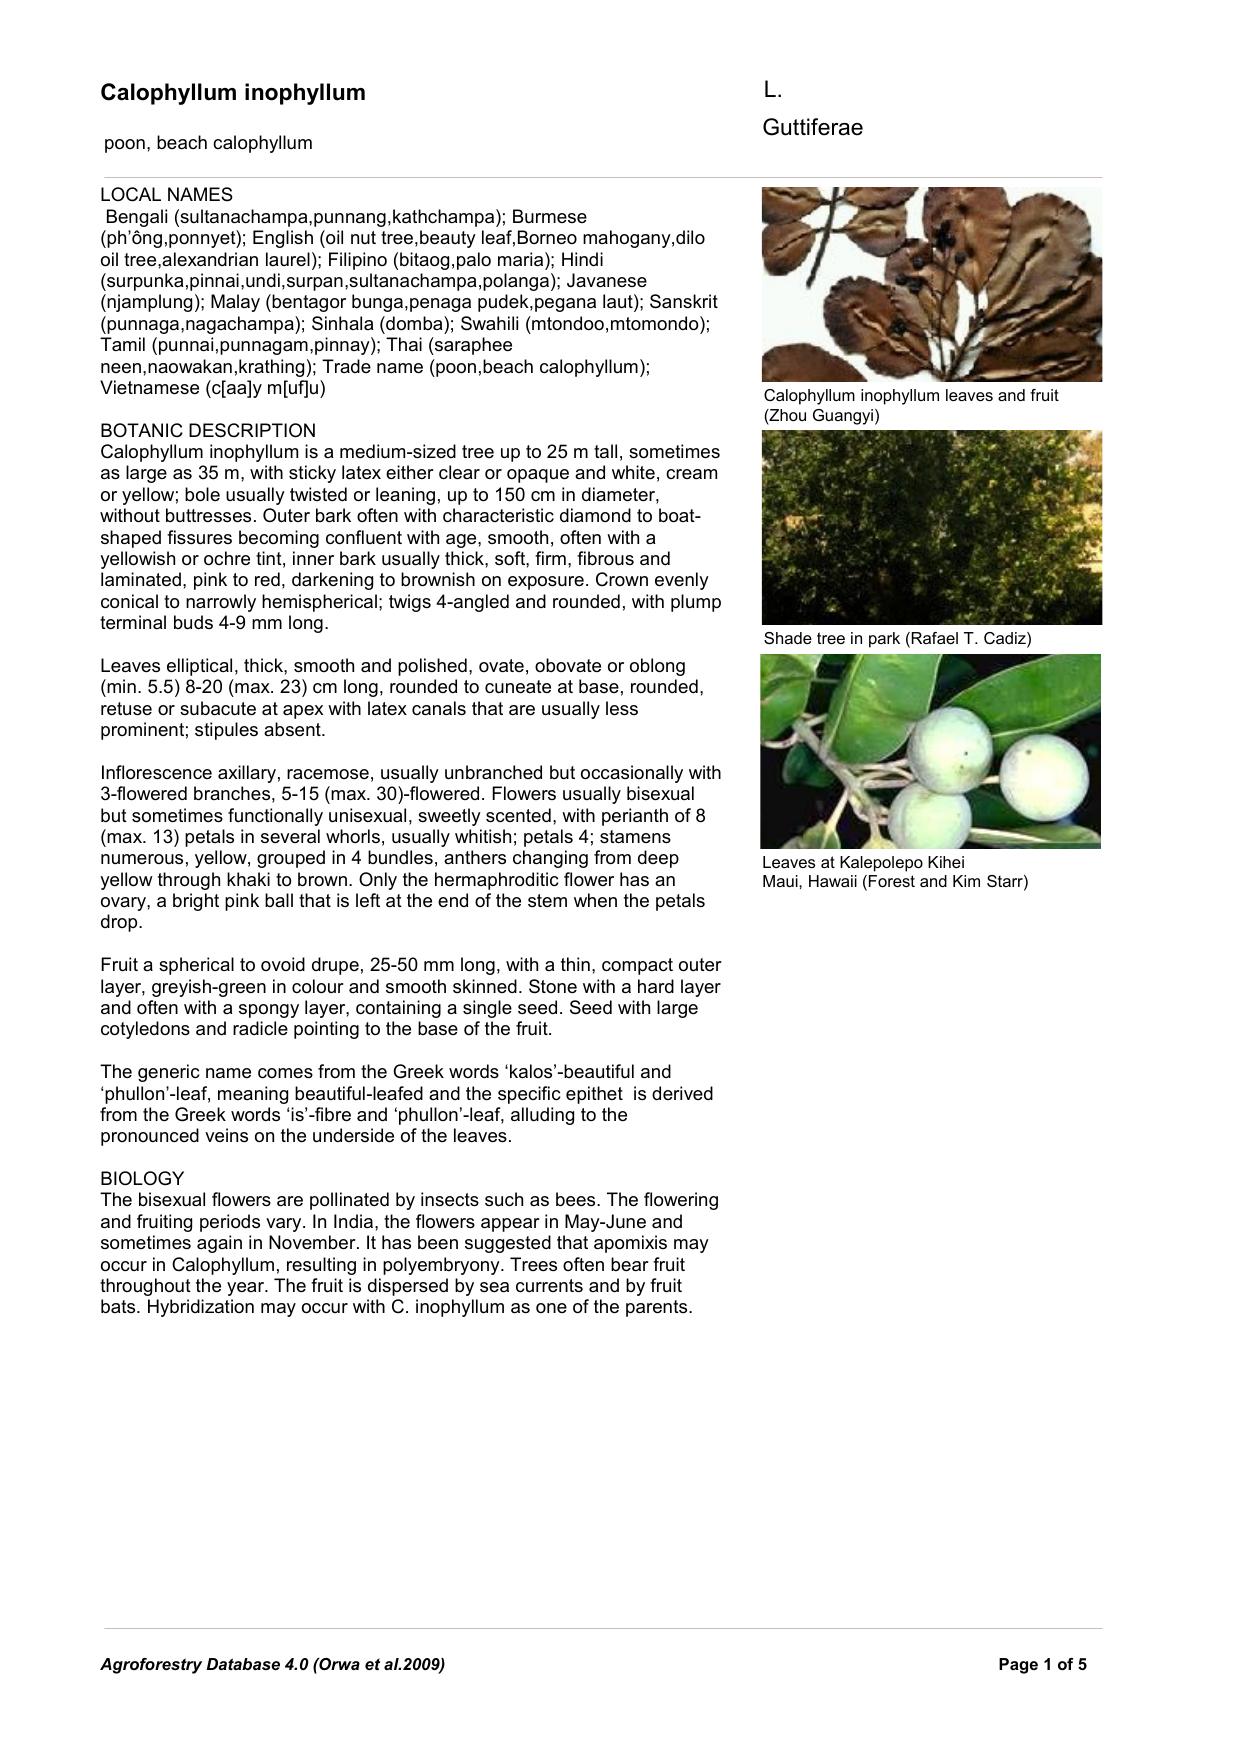 Calophyllum Inophyllum World Agroforestry Centre